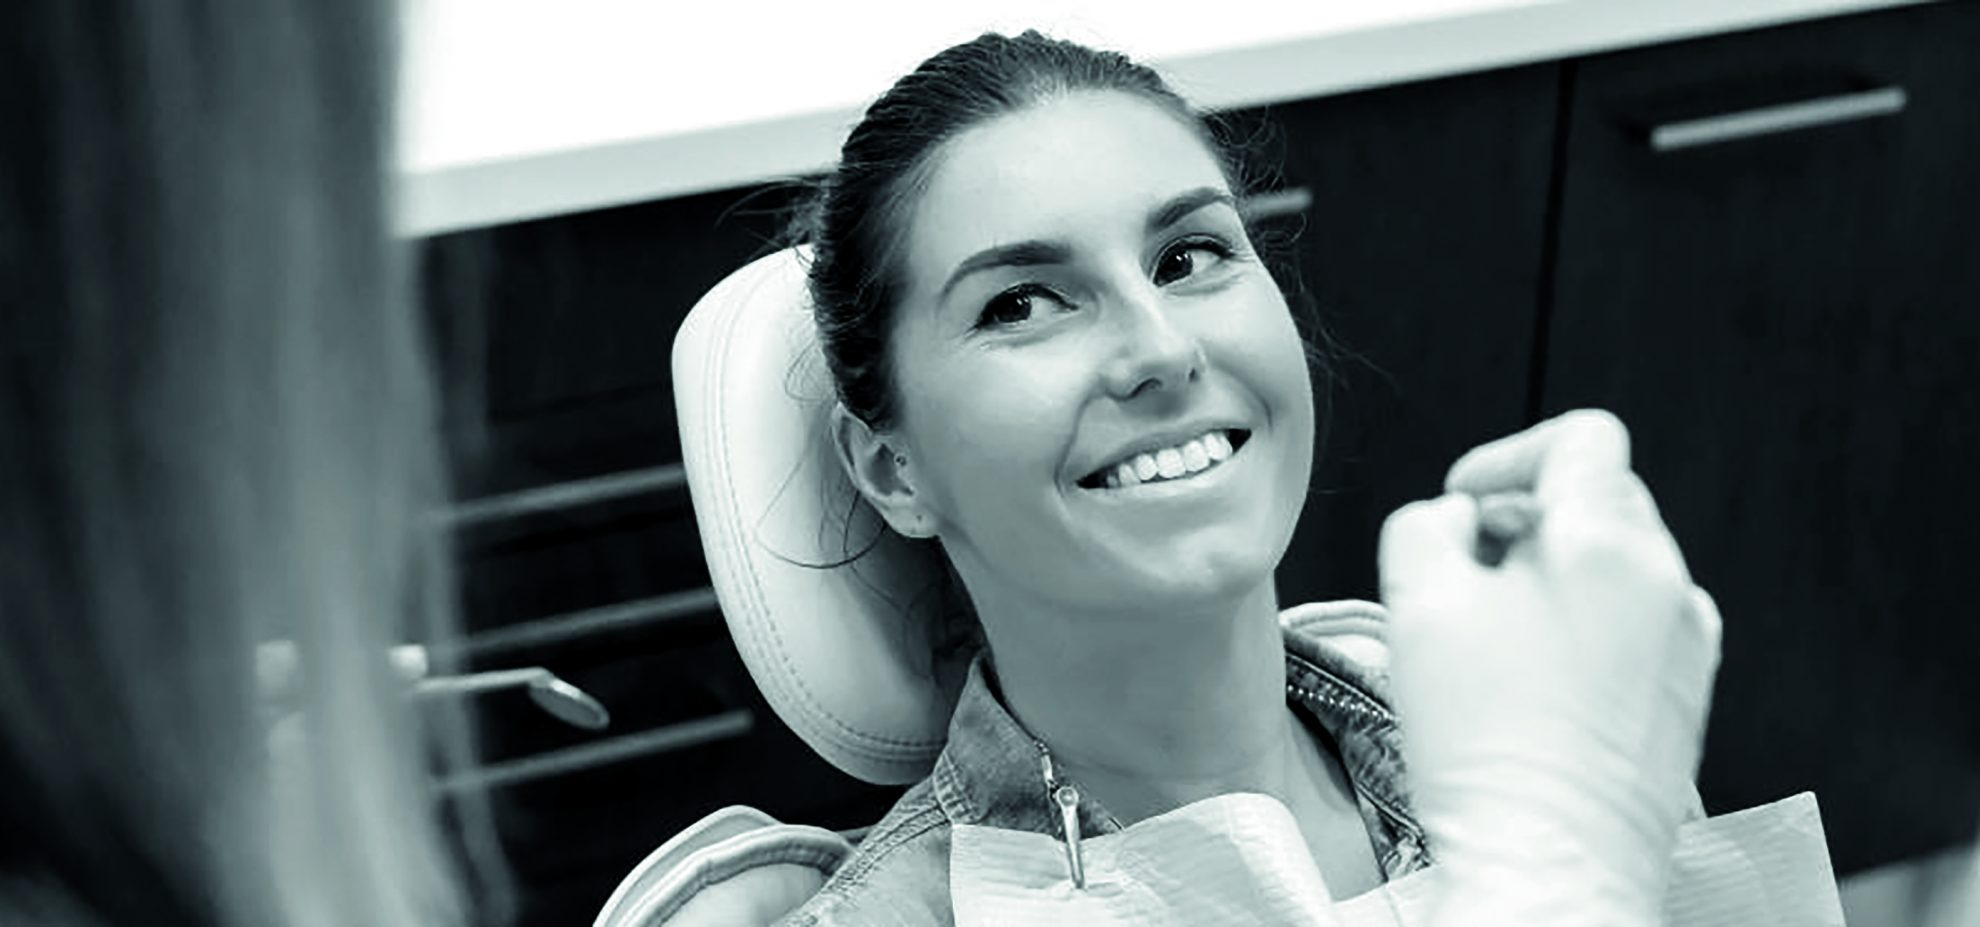 implant dentaire Espagne